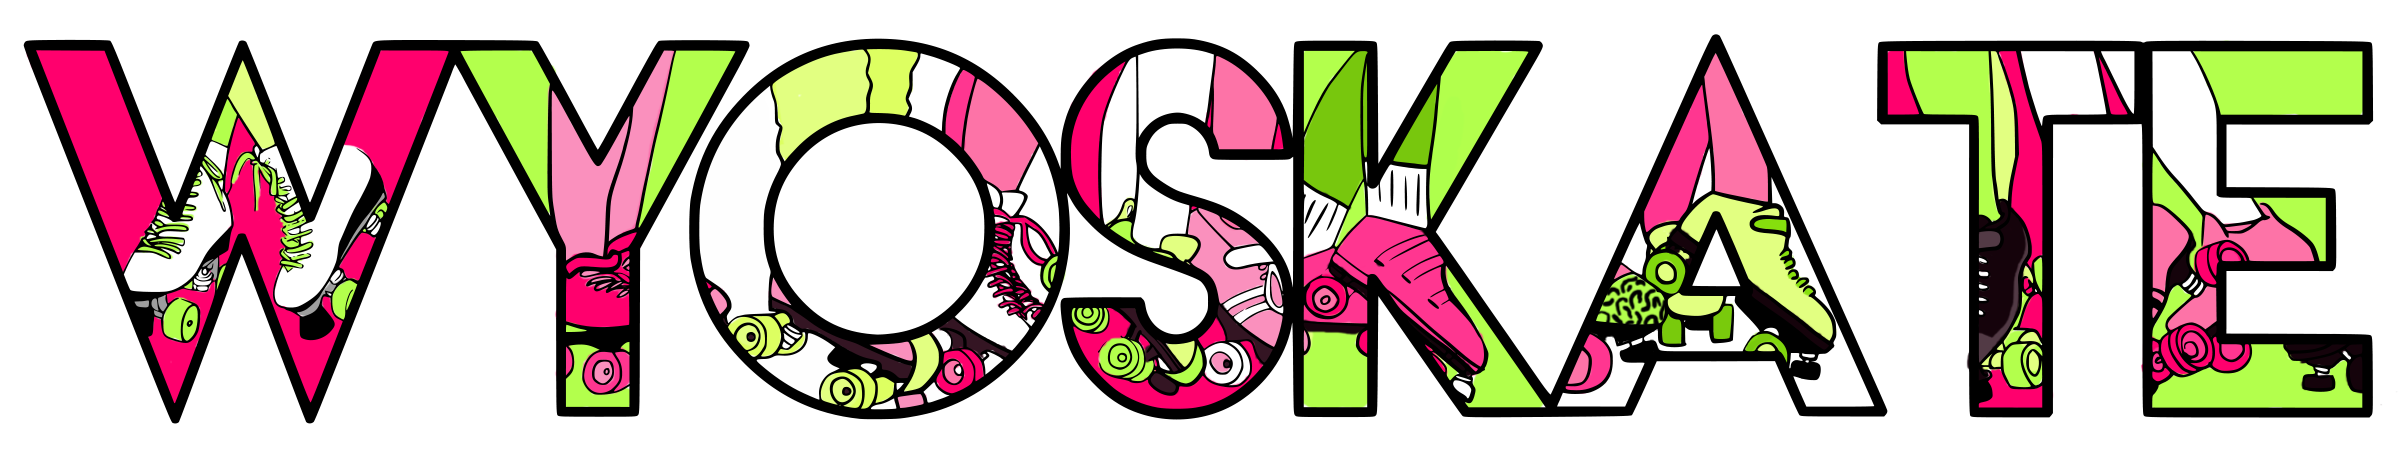 wyoskate logo color